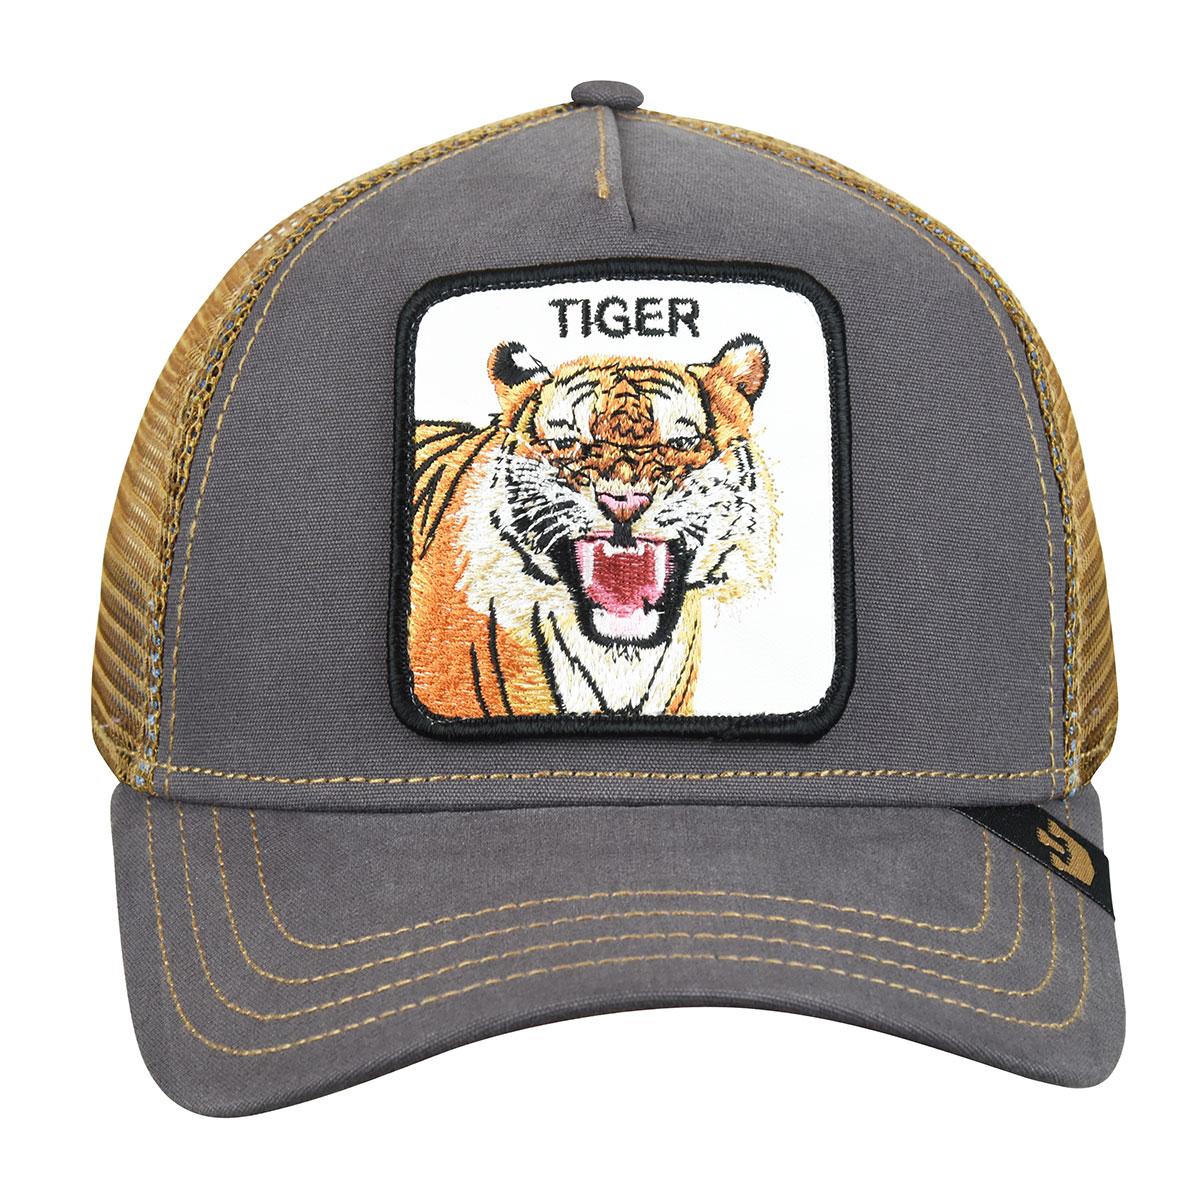 Goorin Bros. Eye of the Tiger Trucker in Brown